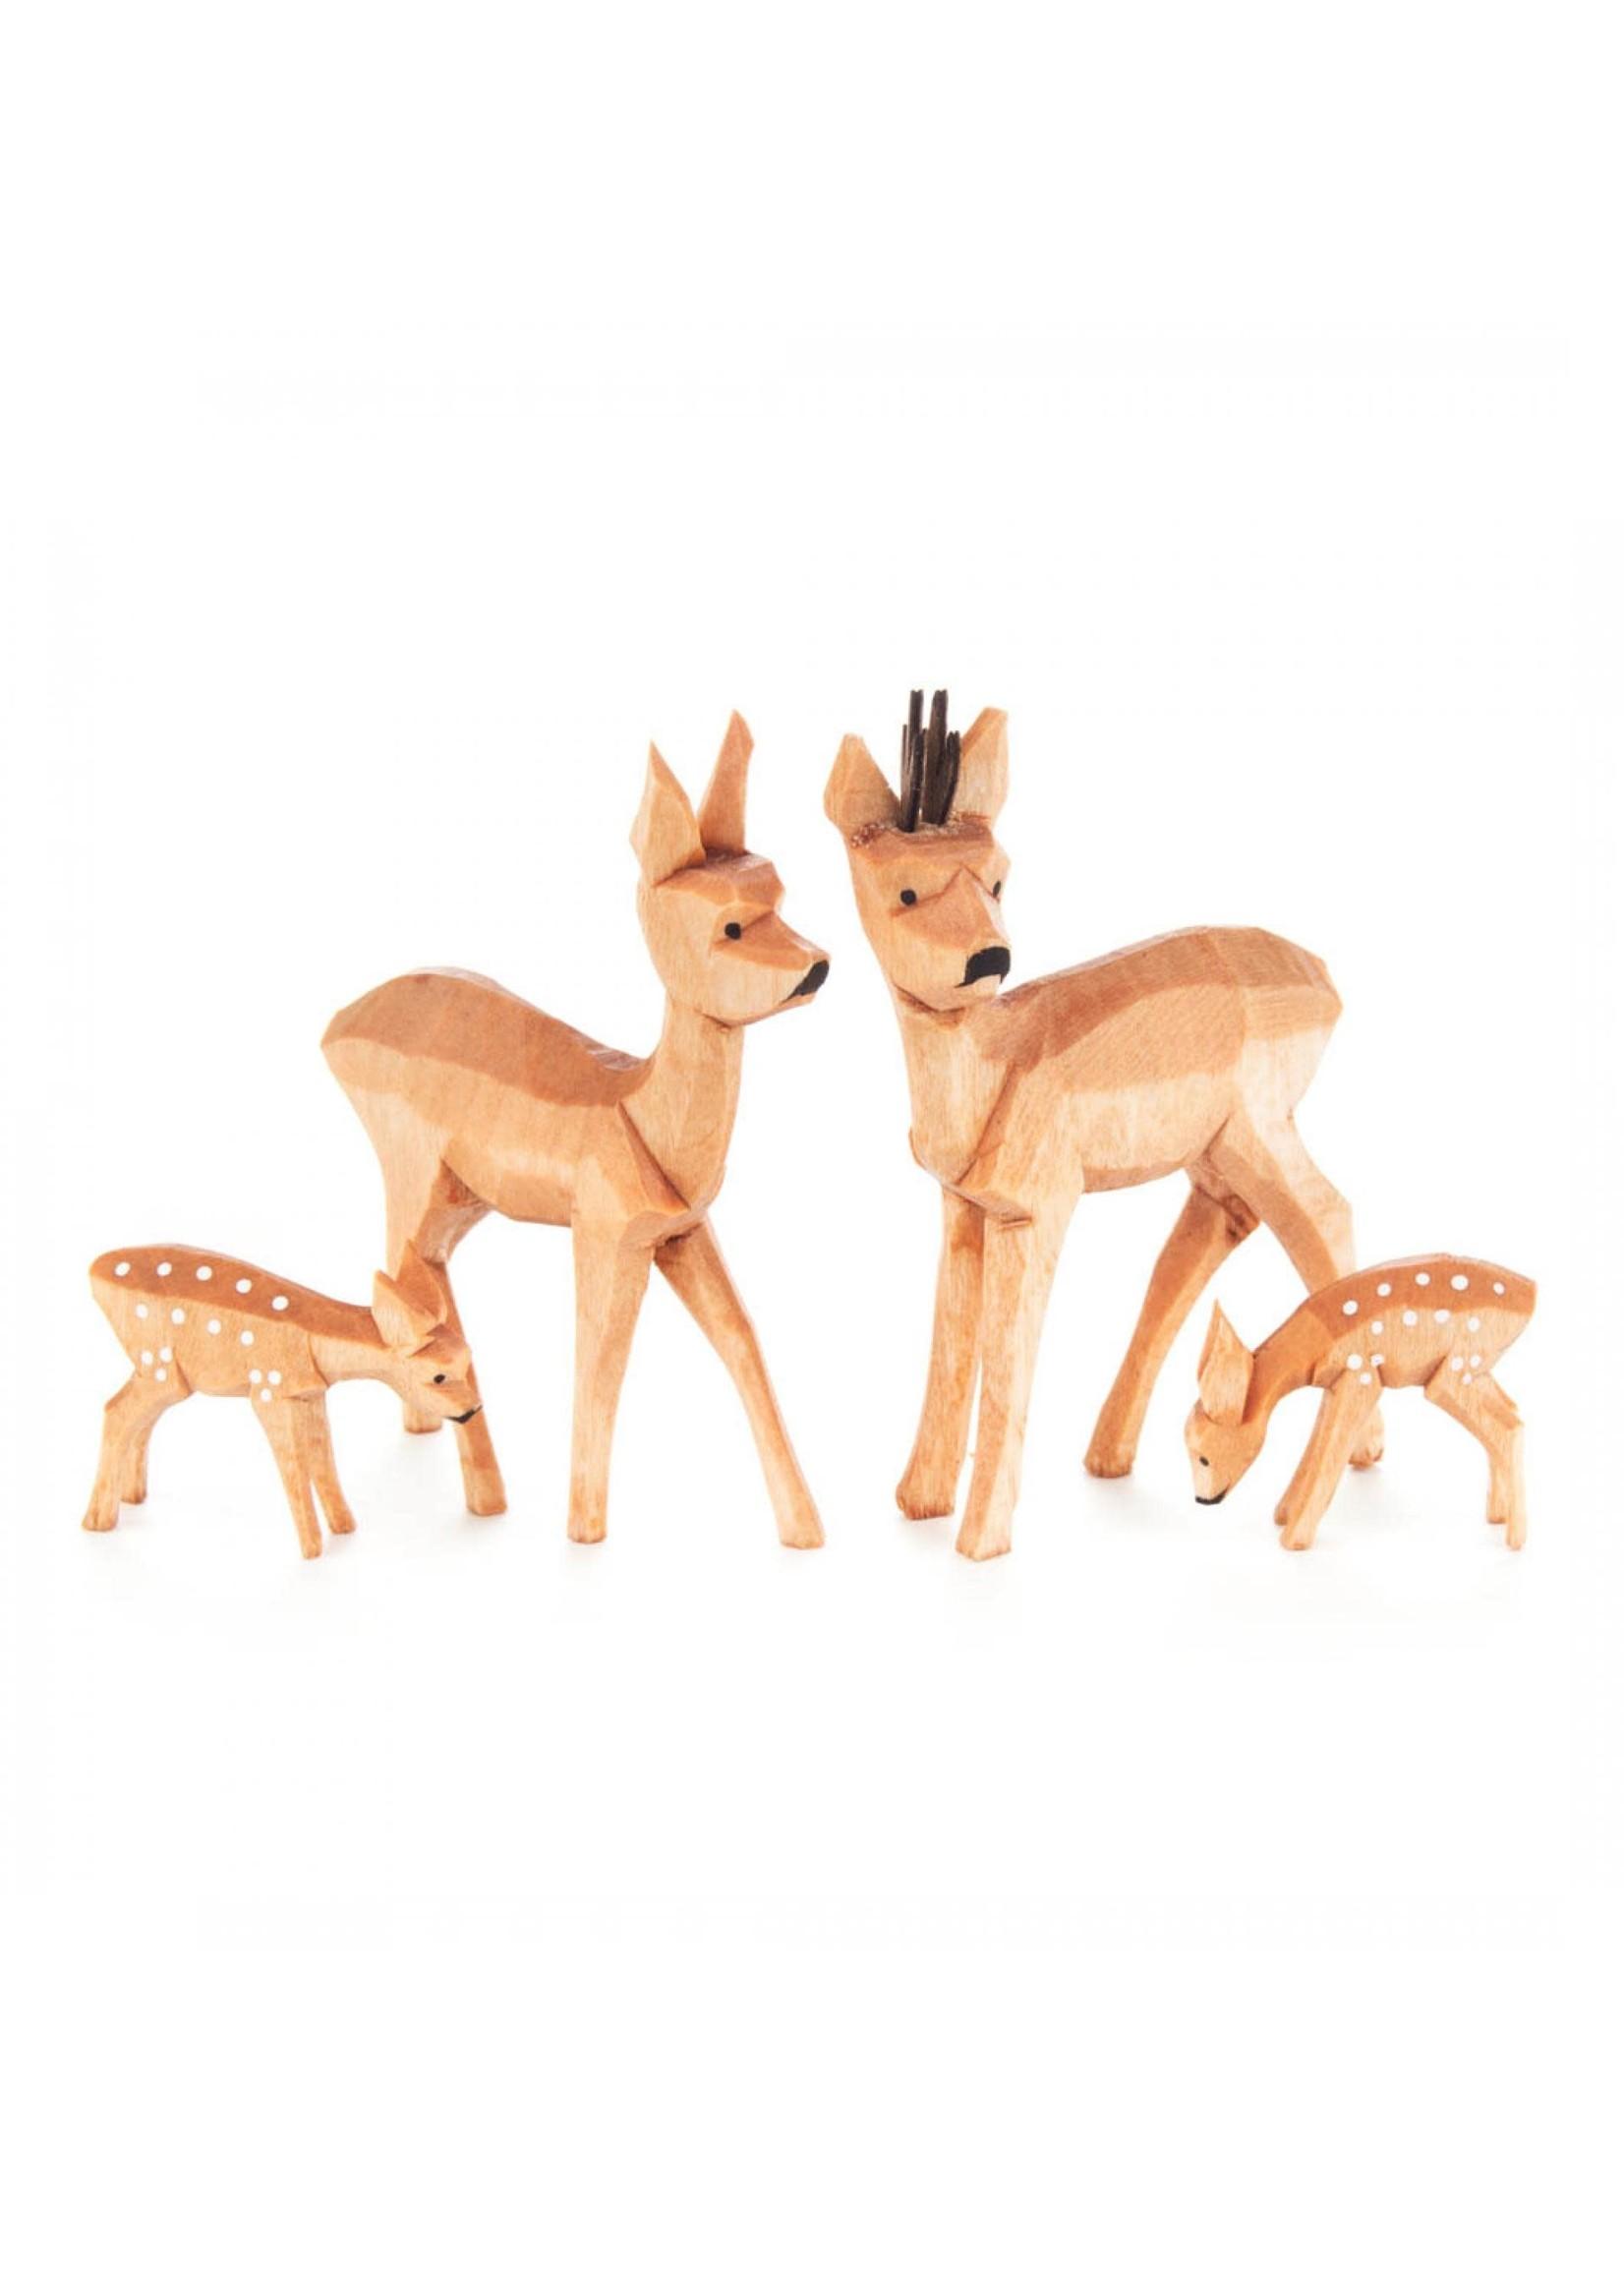 Deer Family (4 piece set)